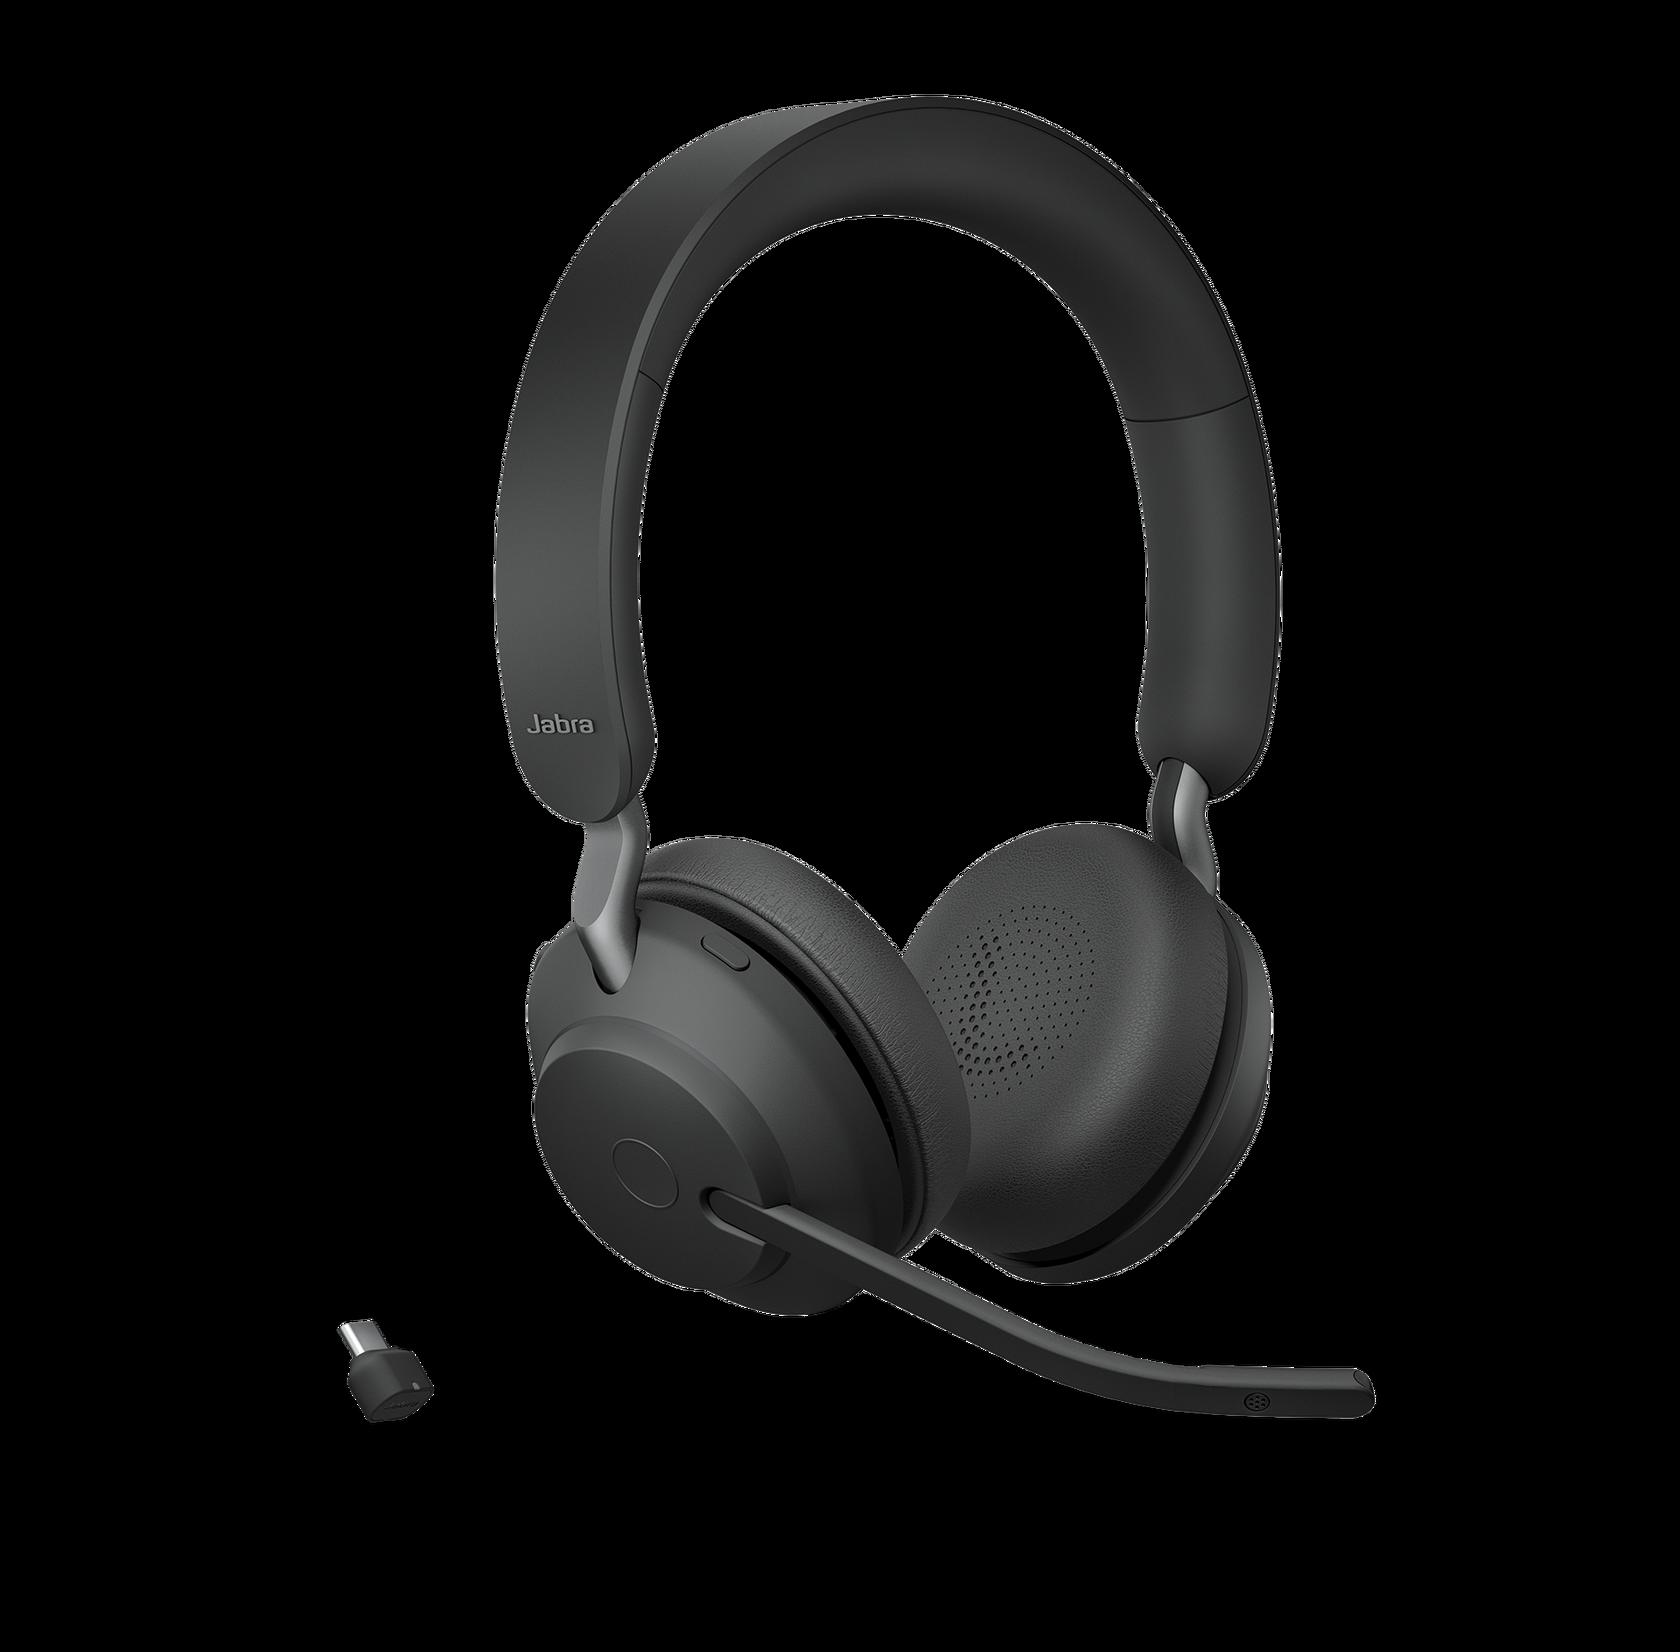 jabra evolve 65 bluetooth headsets